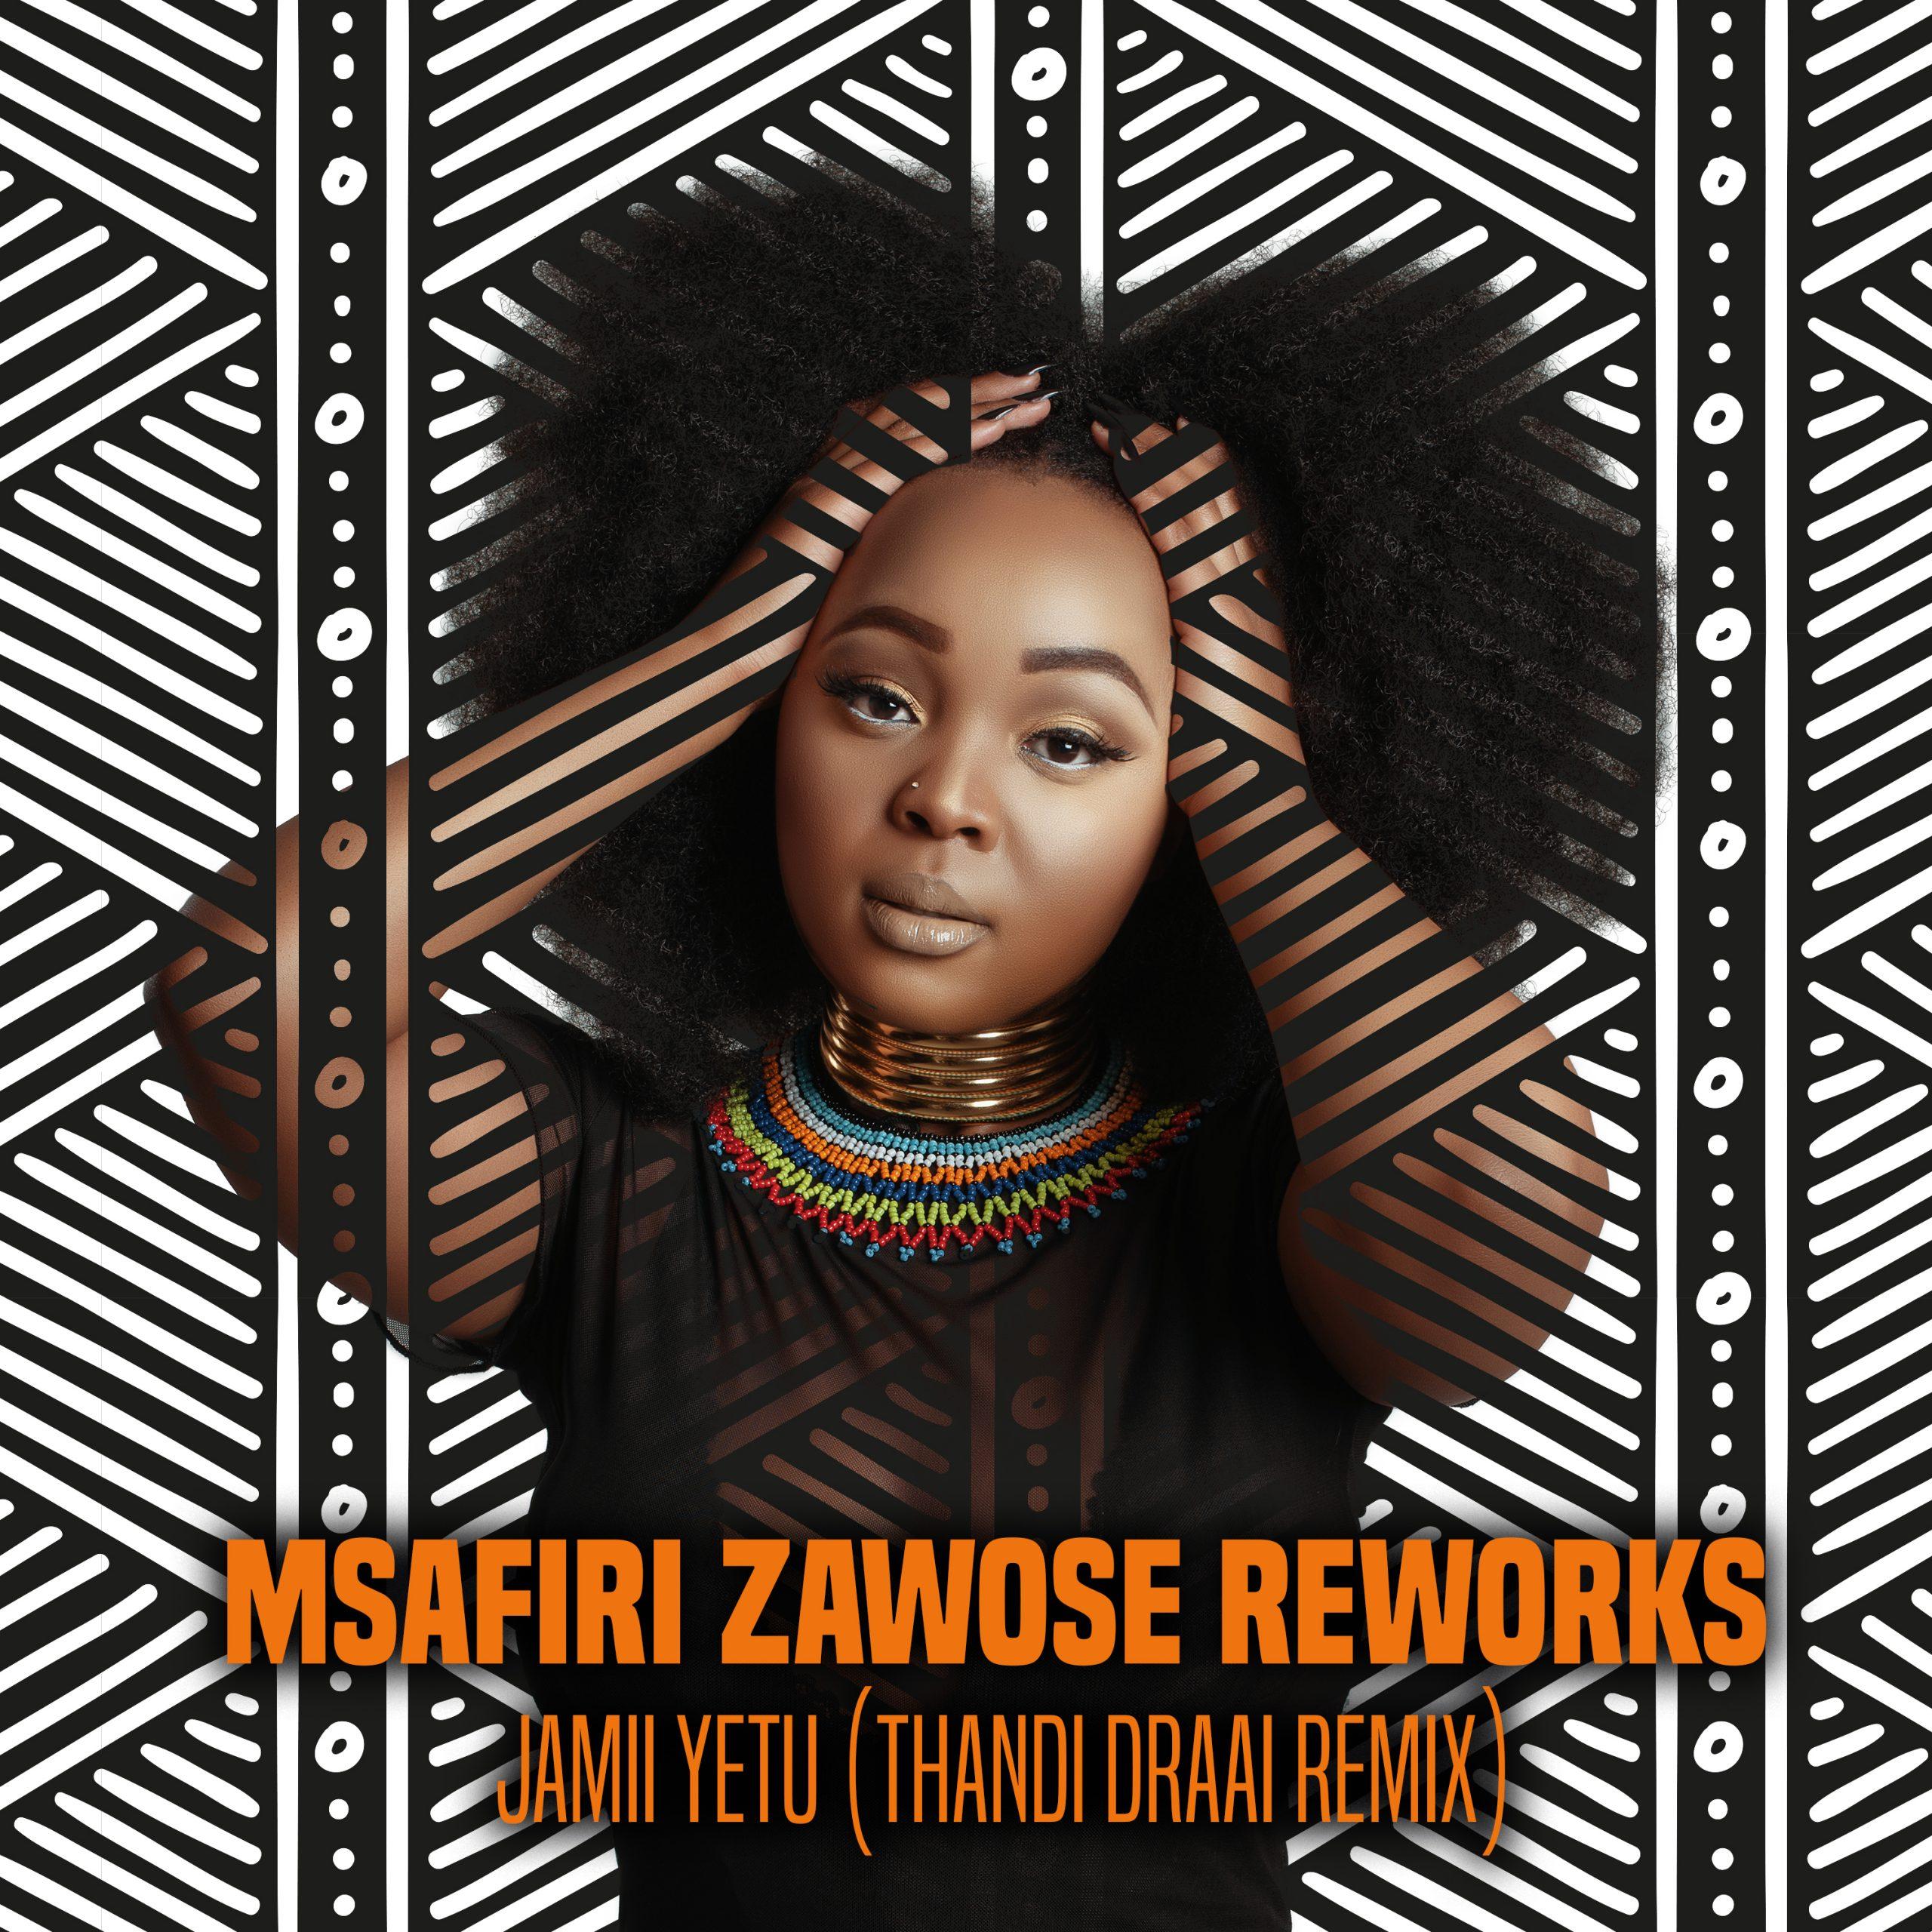 Thandi Draai remixes Msafiri Zawose's Jamii Yetu